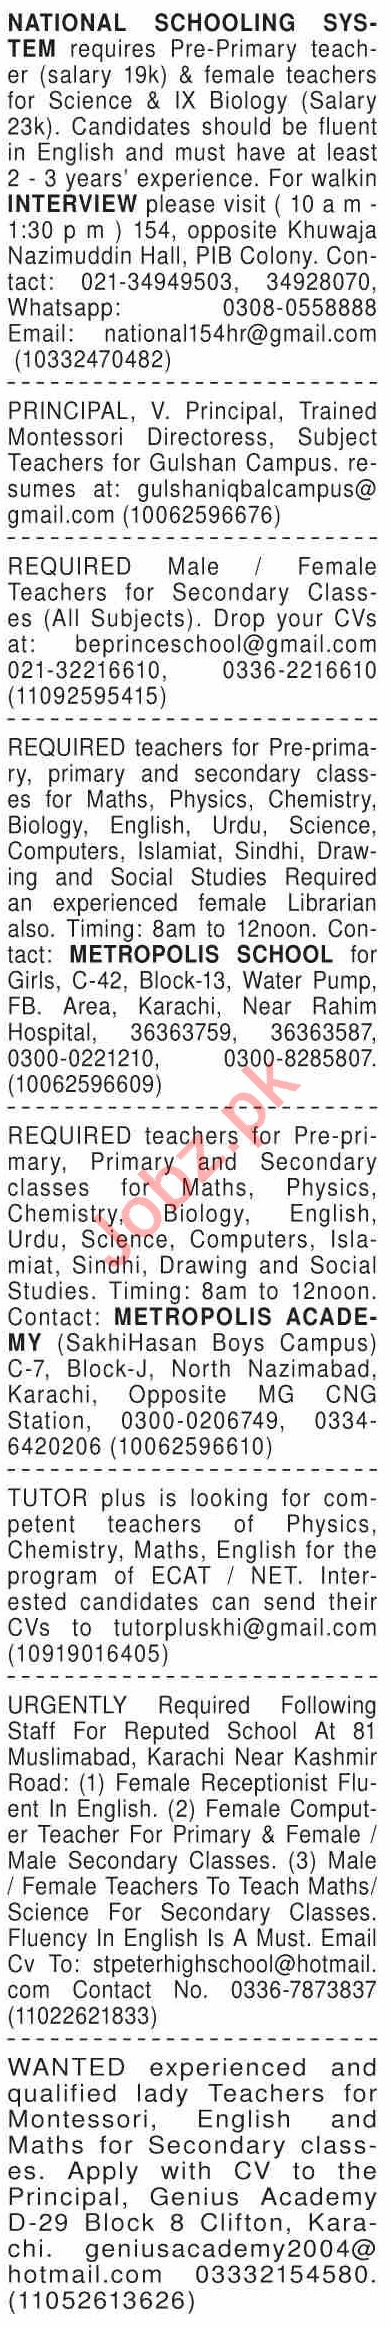 Dawn Sunday Classified Ads 10 Jan 2021 for Teaching Staff